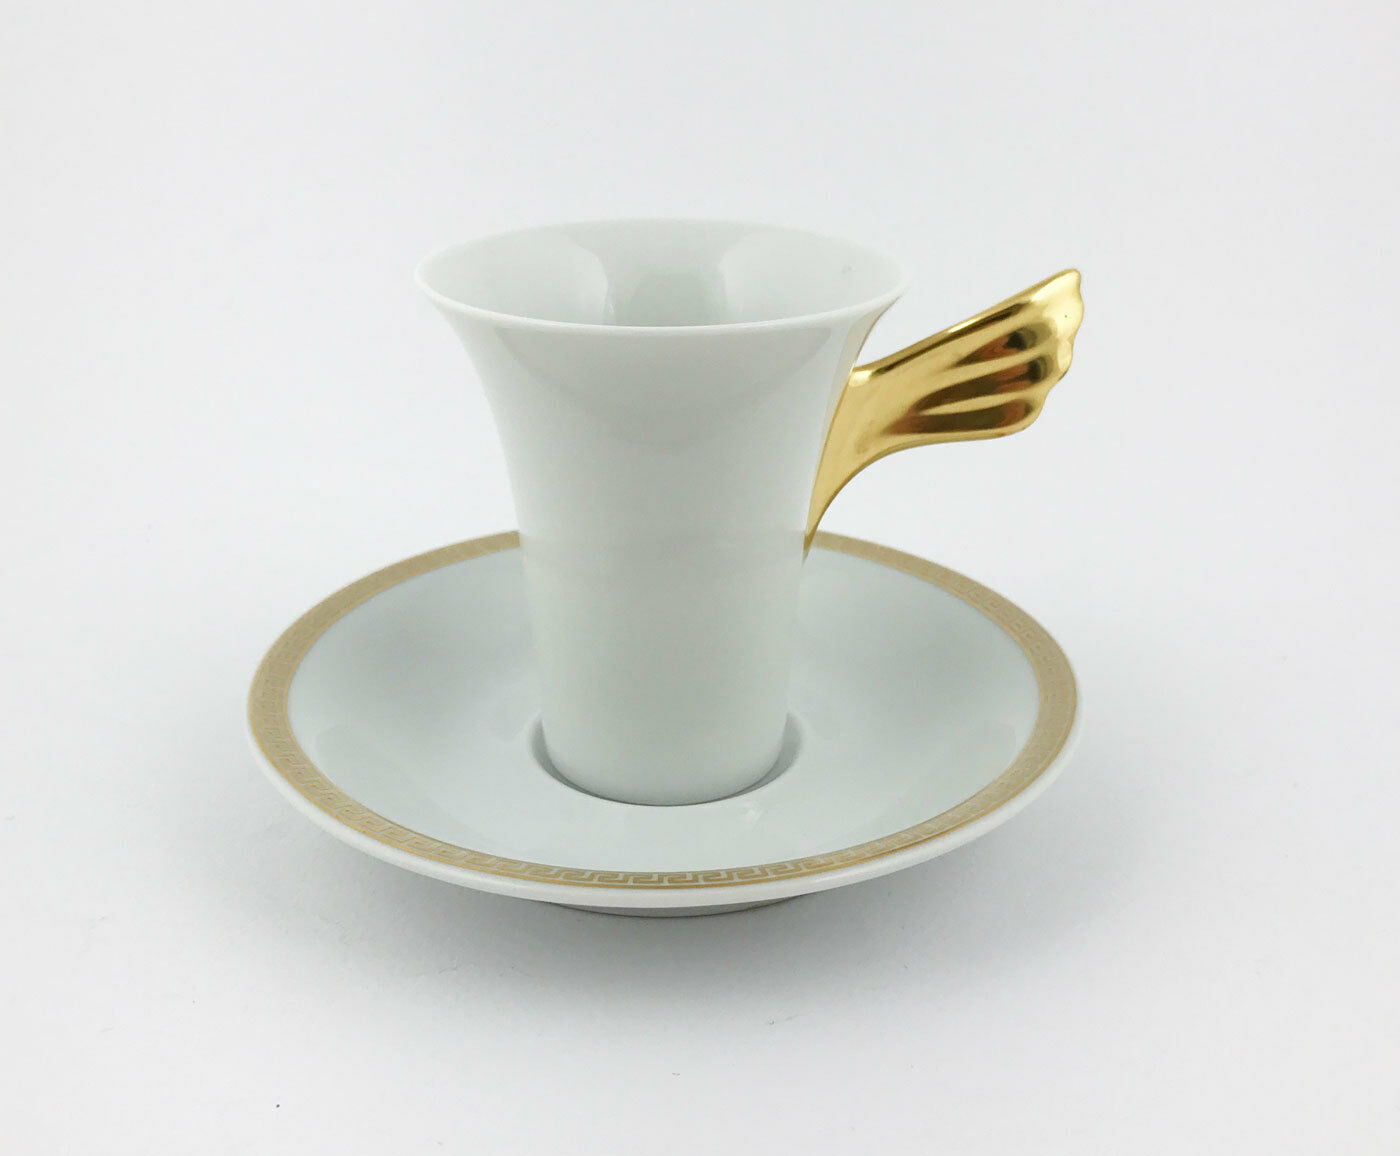 19310 409950 14720 Rosenthal Versace Medaillon Meandre d'or tazza caffè espresso